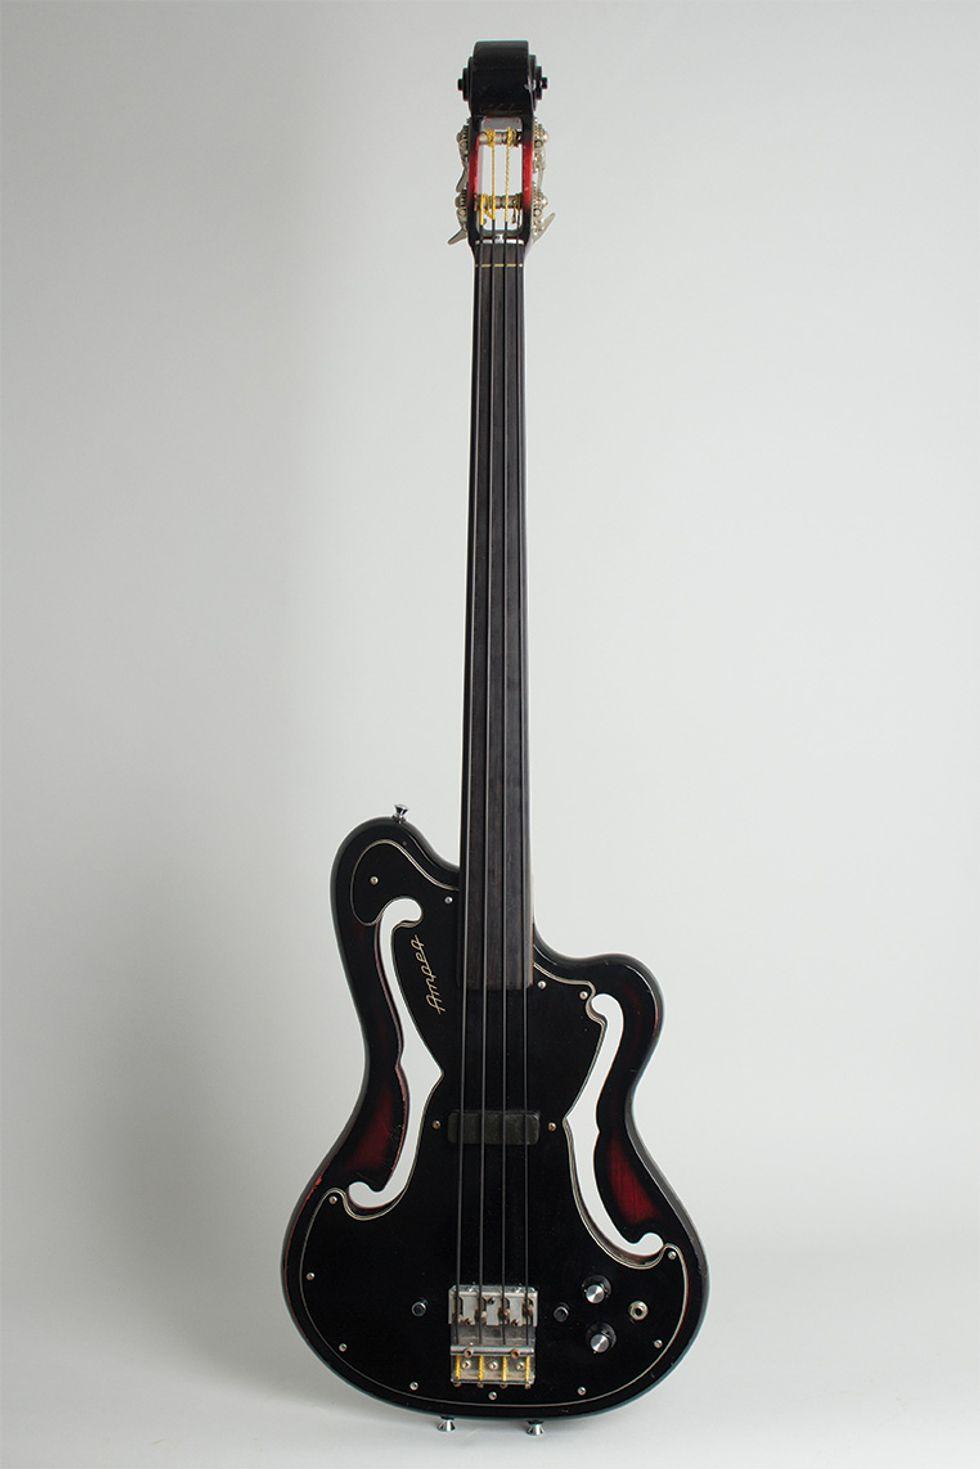 Walter Becker's 1968 Ampeg AMUB-1 Bass homepage